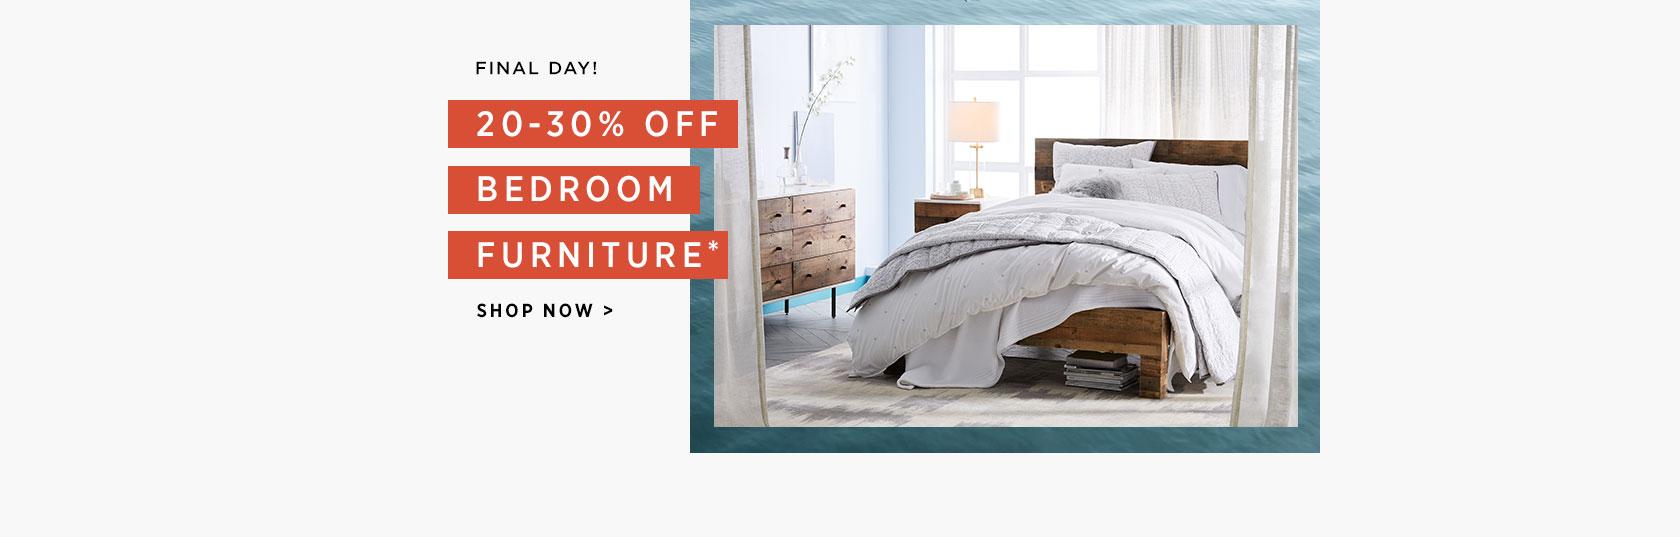 Final Day! 20-30% Off Bedroom Furniture